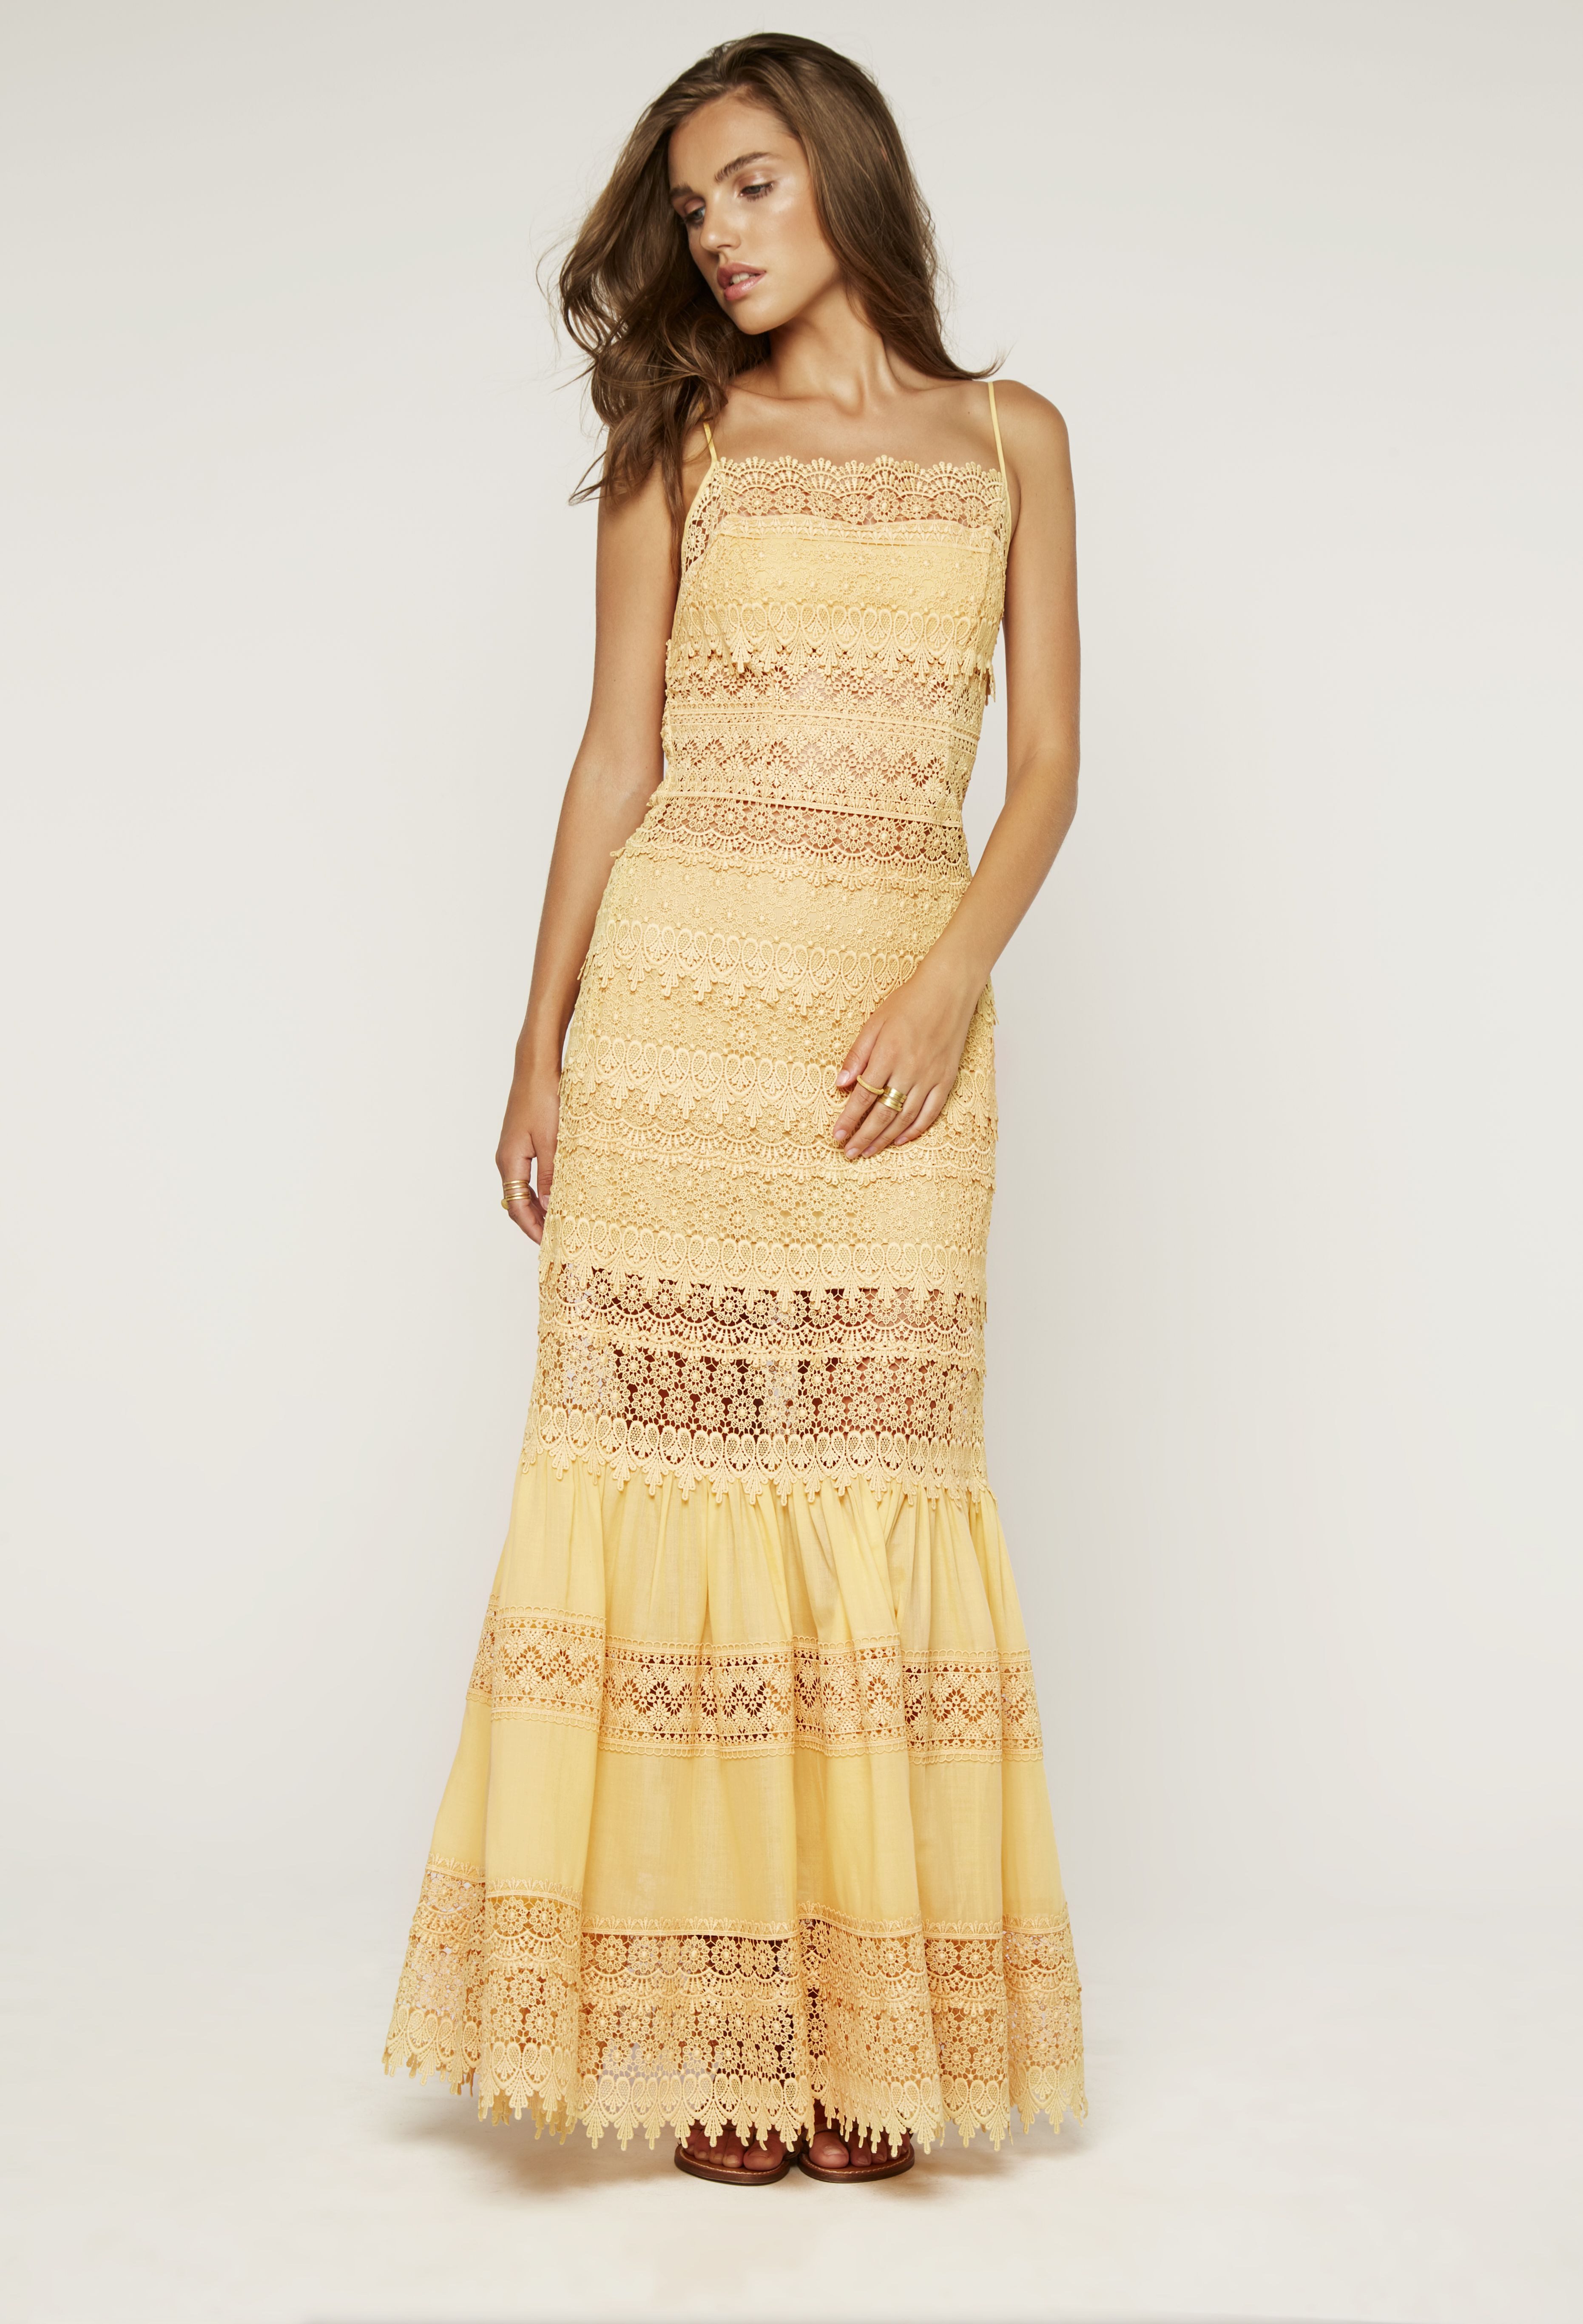 New And Fashion Grace Dress Charo Ruiz Ibiza View Cheap Price Cheap Fashion Style Online Cheap 4zxkAu